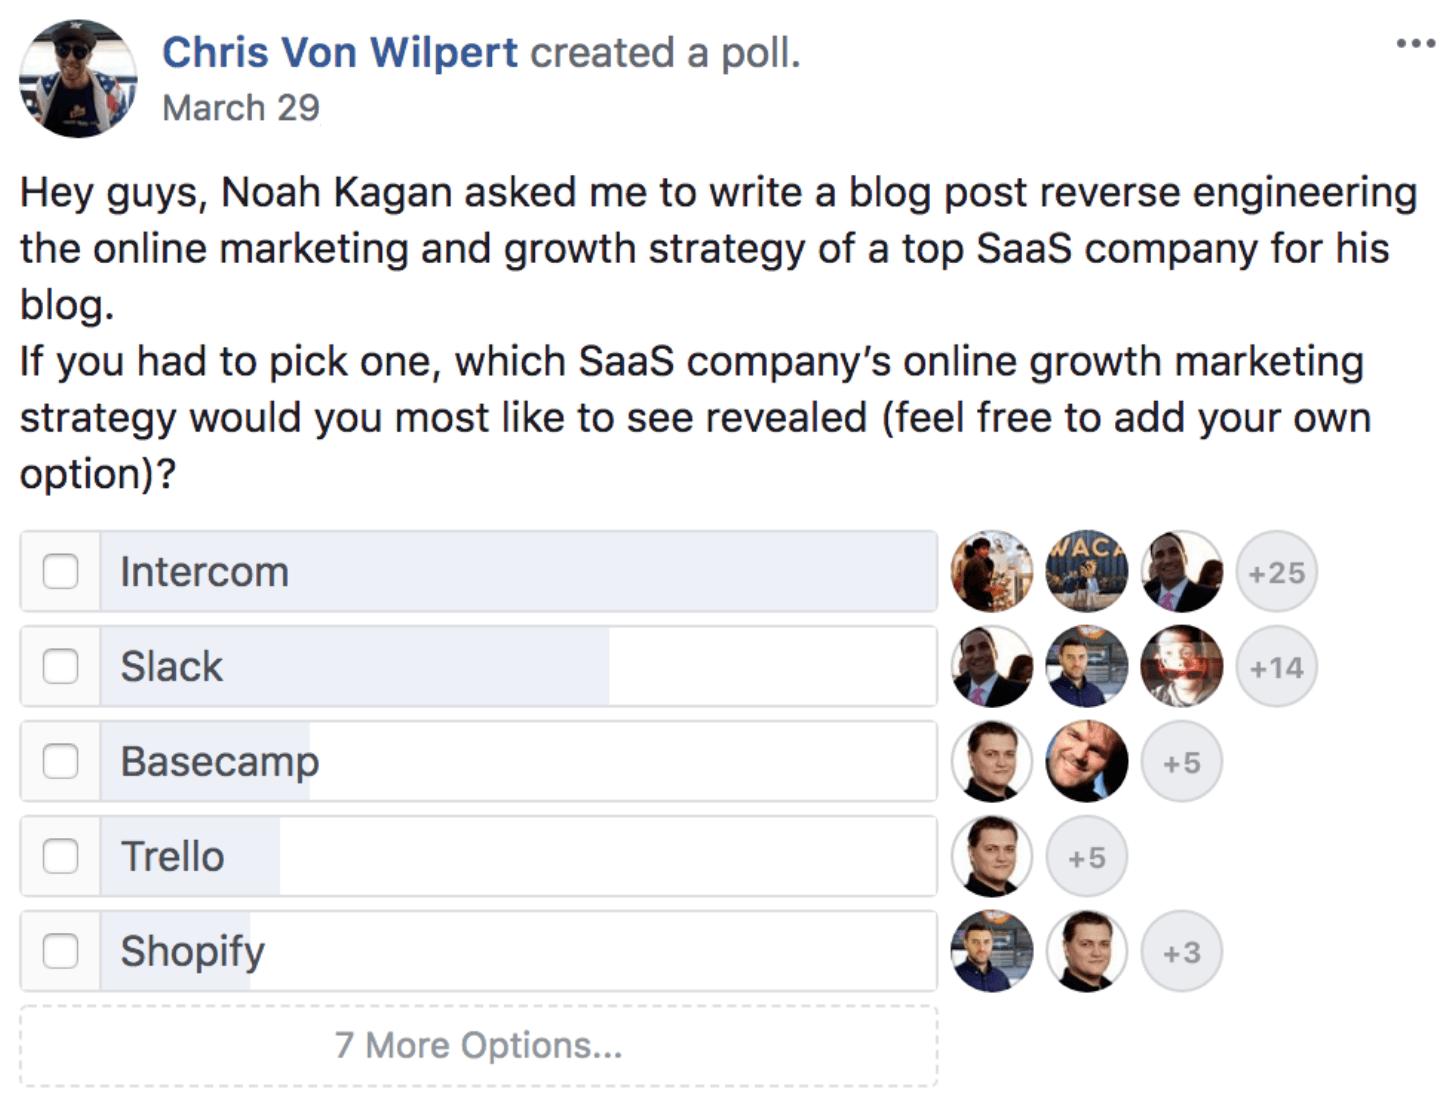 facebook poll content idea image